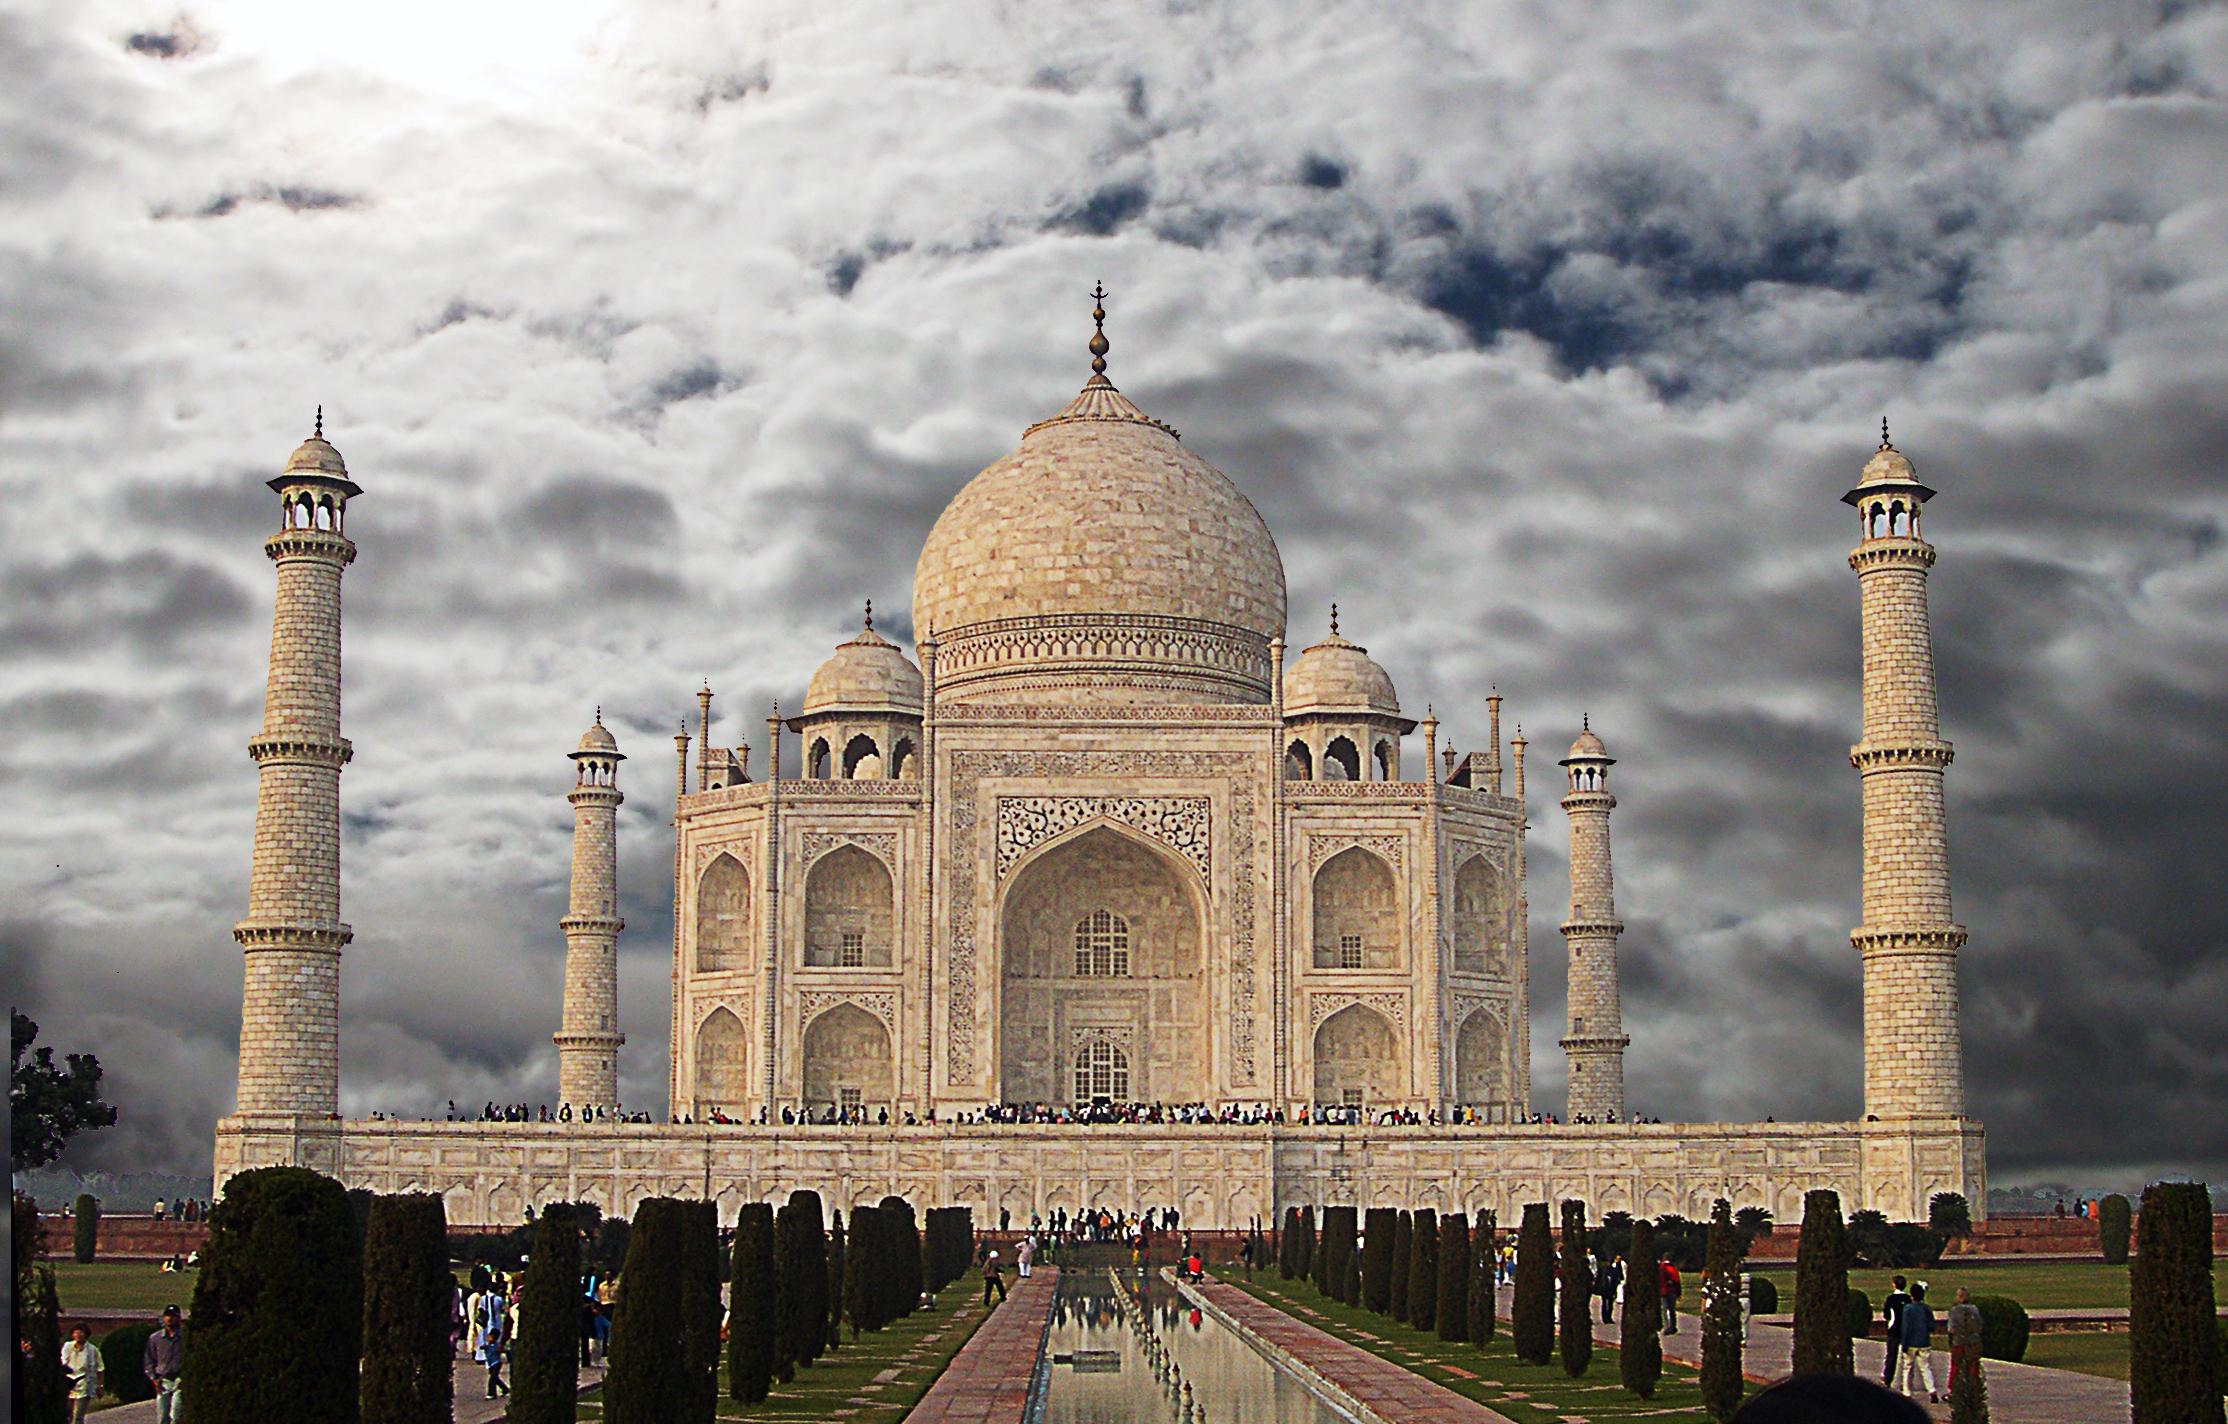 File:Cielo de el Taj Mahal.jpg - Wikimedia Commons